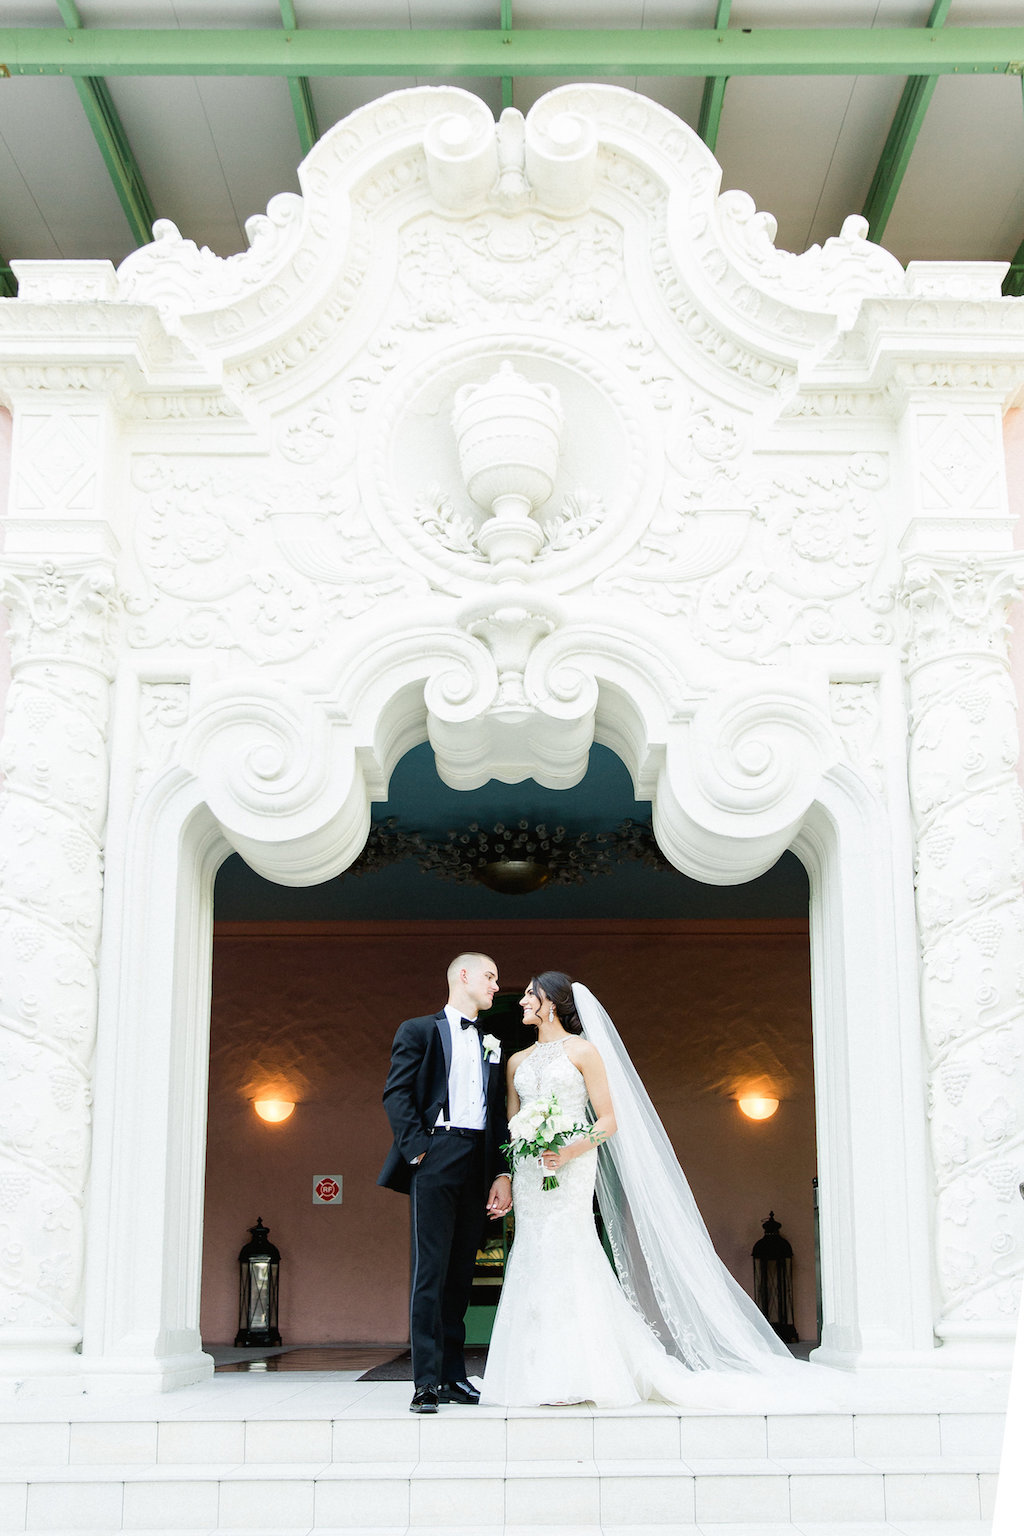 Outdoor Bride and Groom Wedding Portrait   Tampa Wedding Photographer Ailyn La Torre   Venue The Vinoy Renaissance St. Petersburg Resort & Golf Club